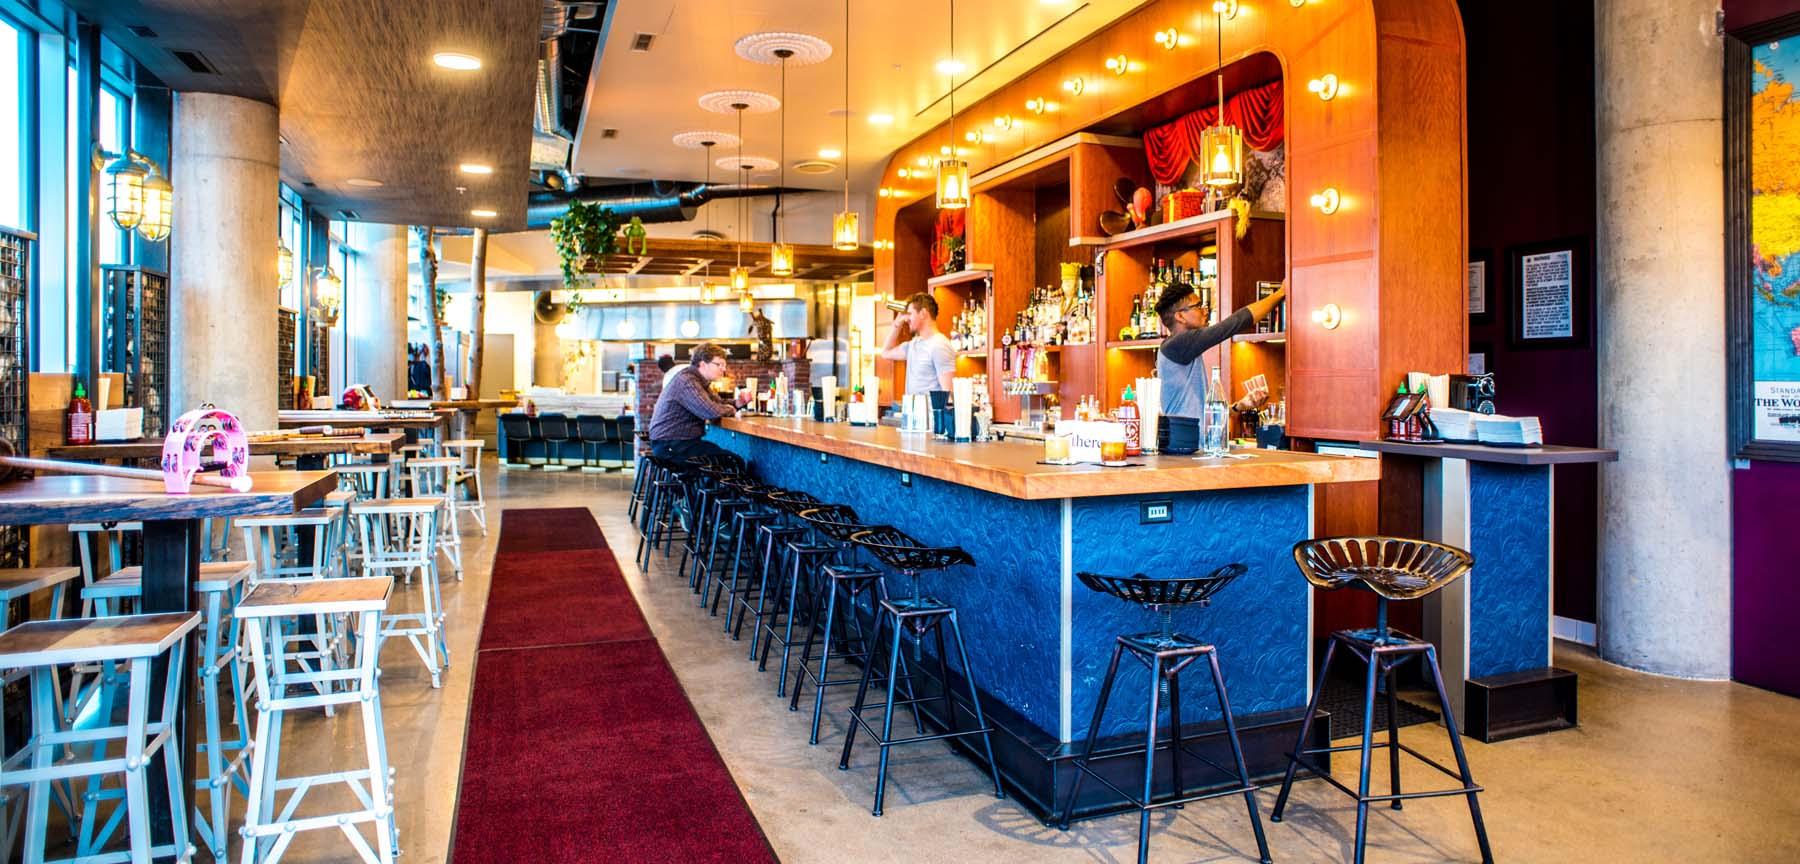 There Bar Restaurant bar area